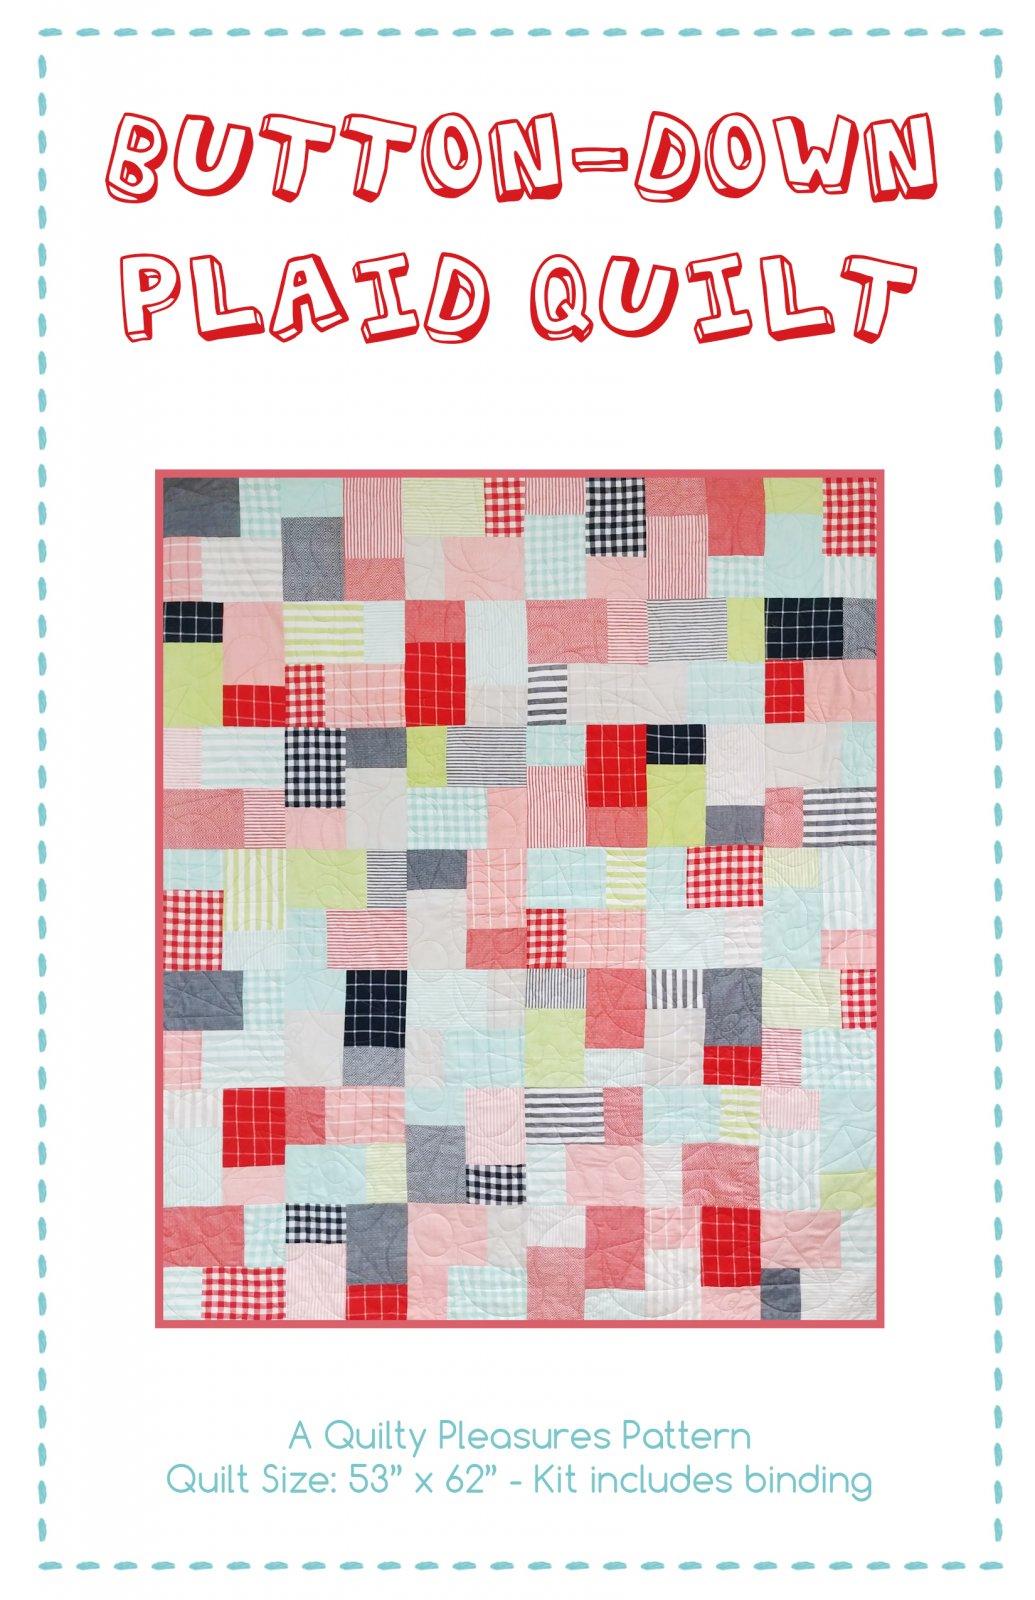 Quilty Pleasures Button-Down Plaid Pattern